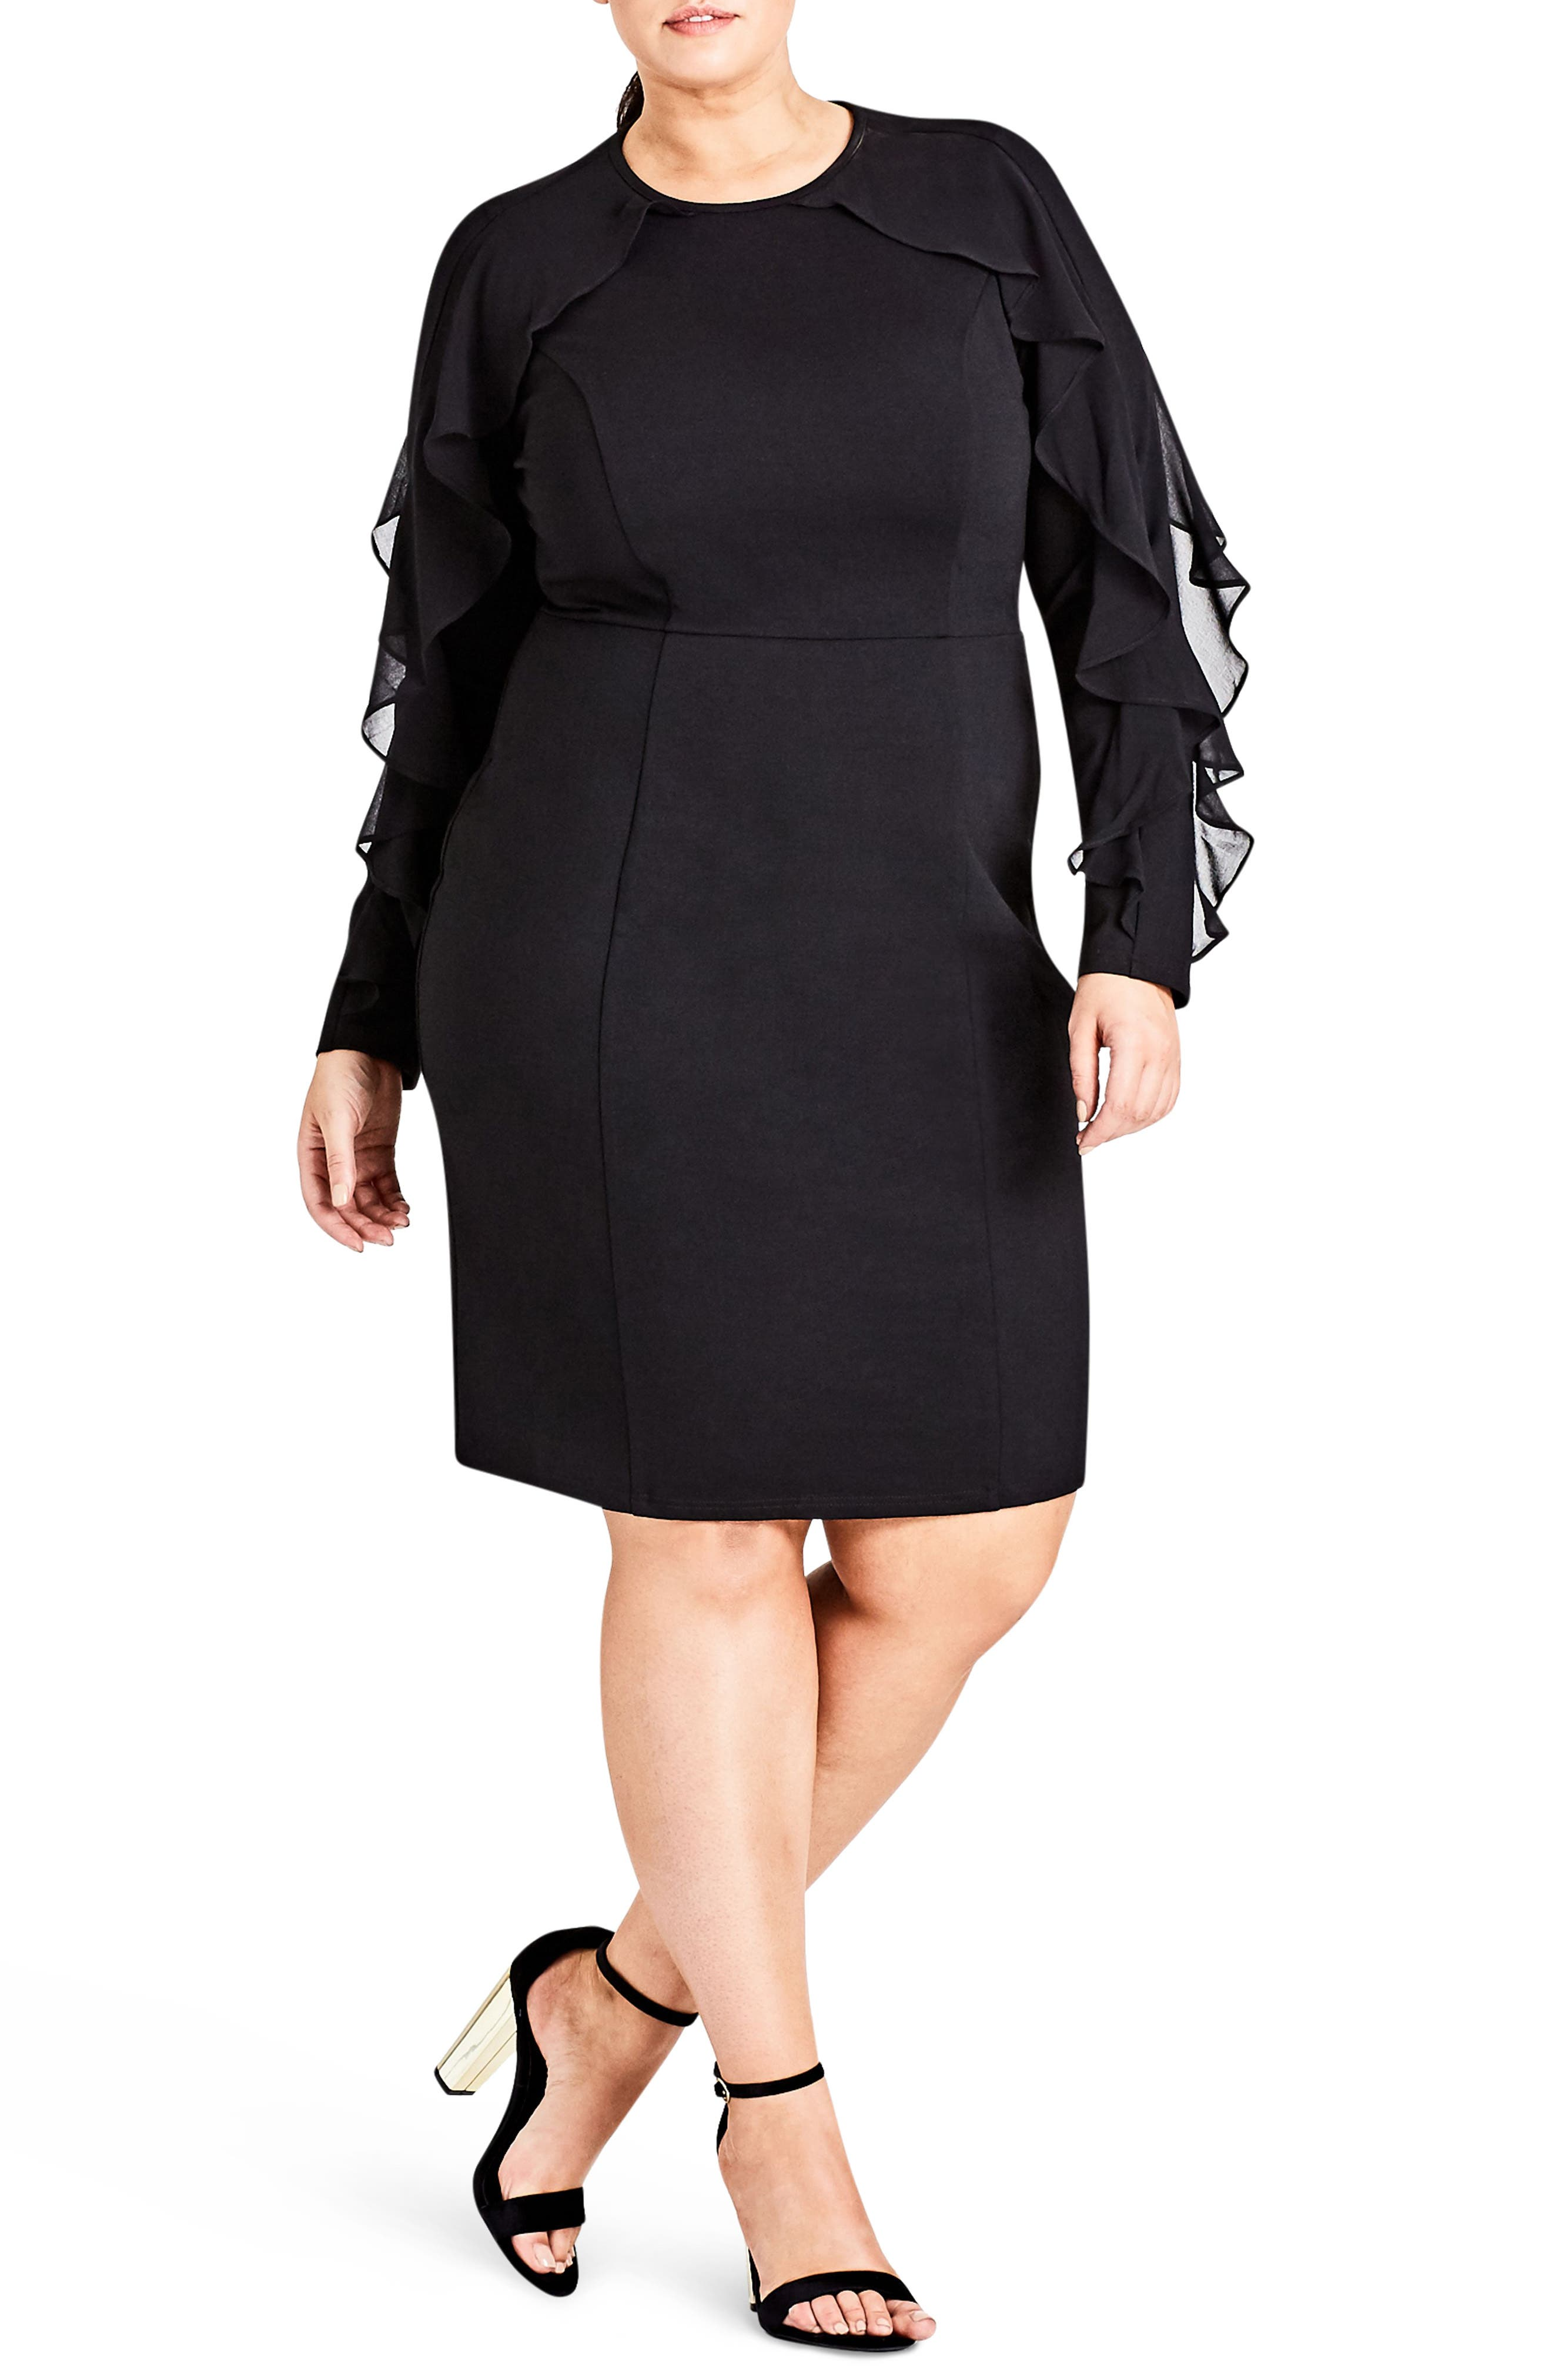 Main Image - Chic City Romantic Sleeve Sheath Dress (Plus Size)